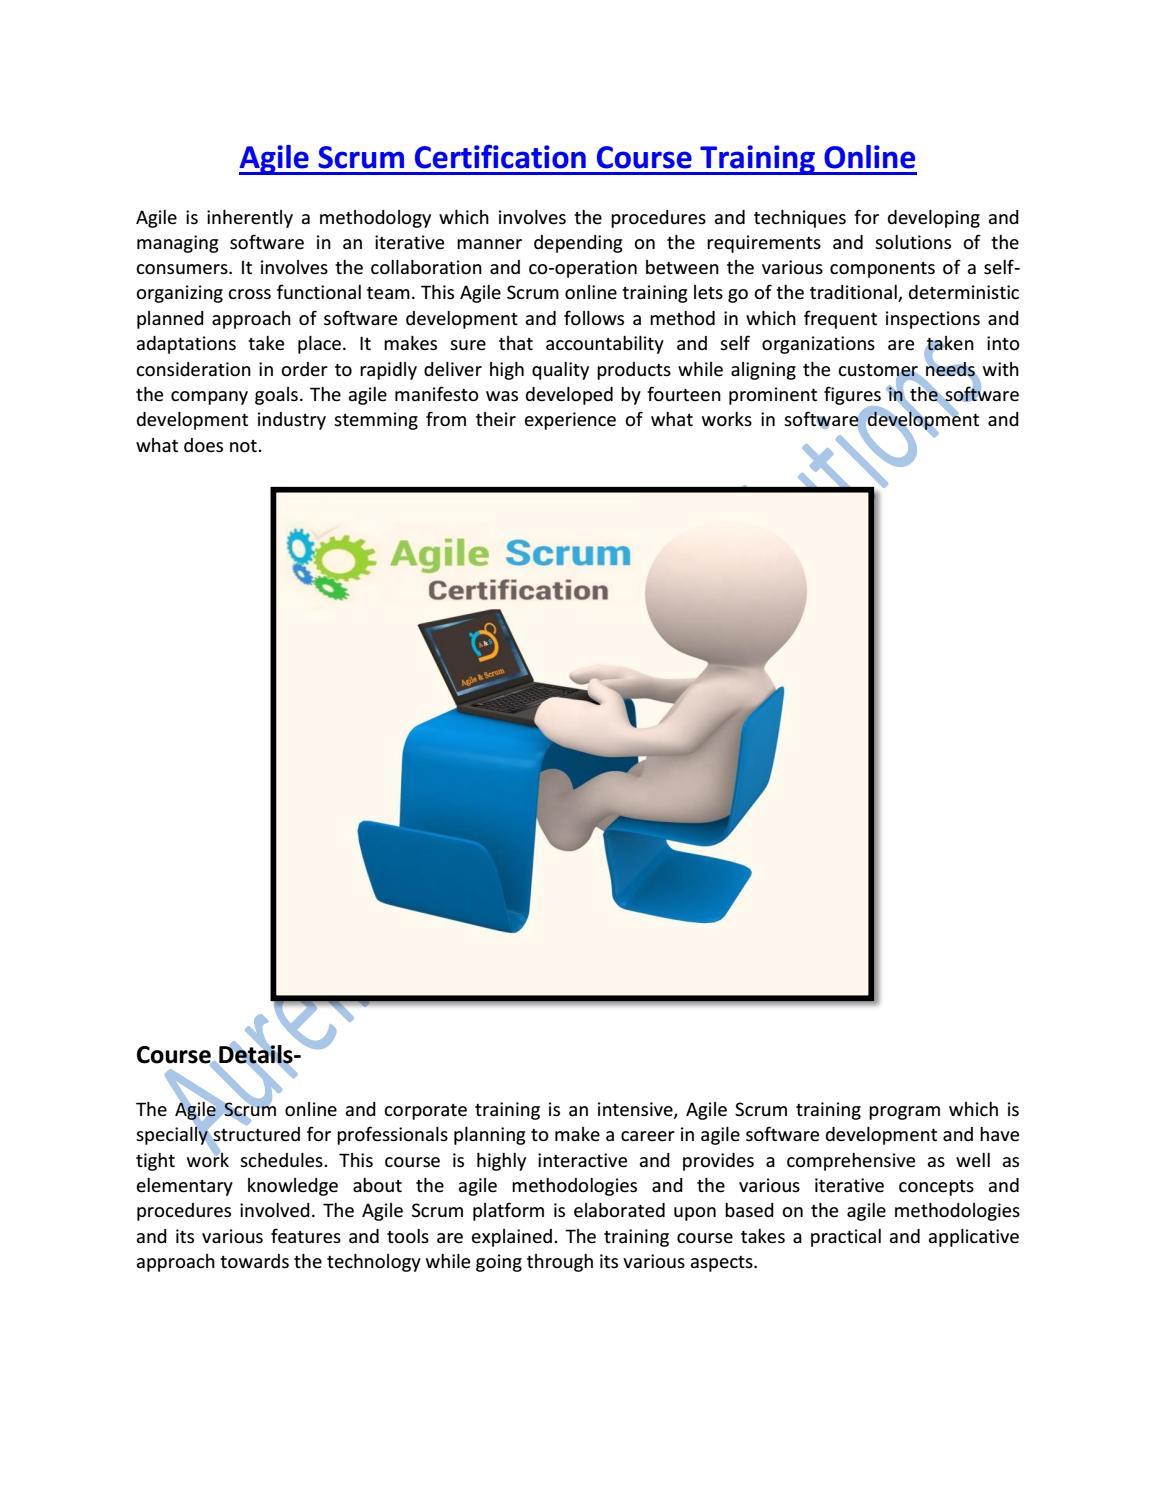 Agile Scrum Certification Course Training Online By Aurelius